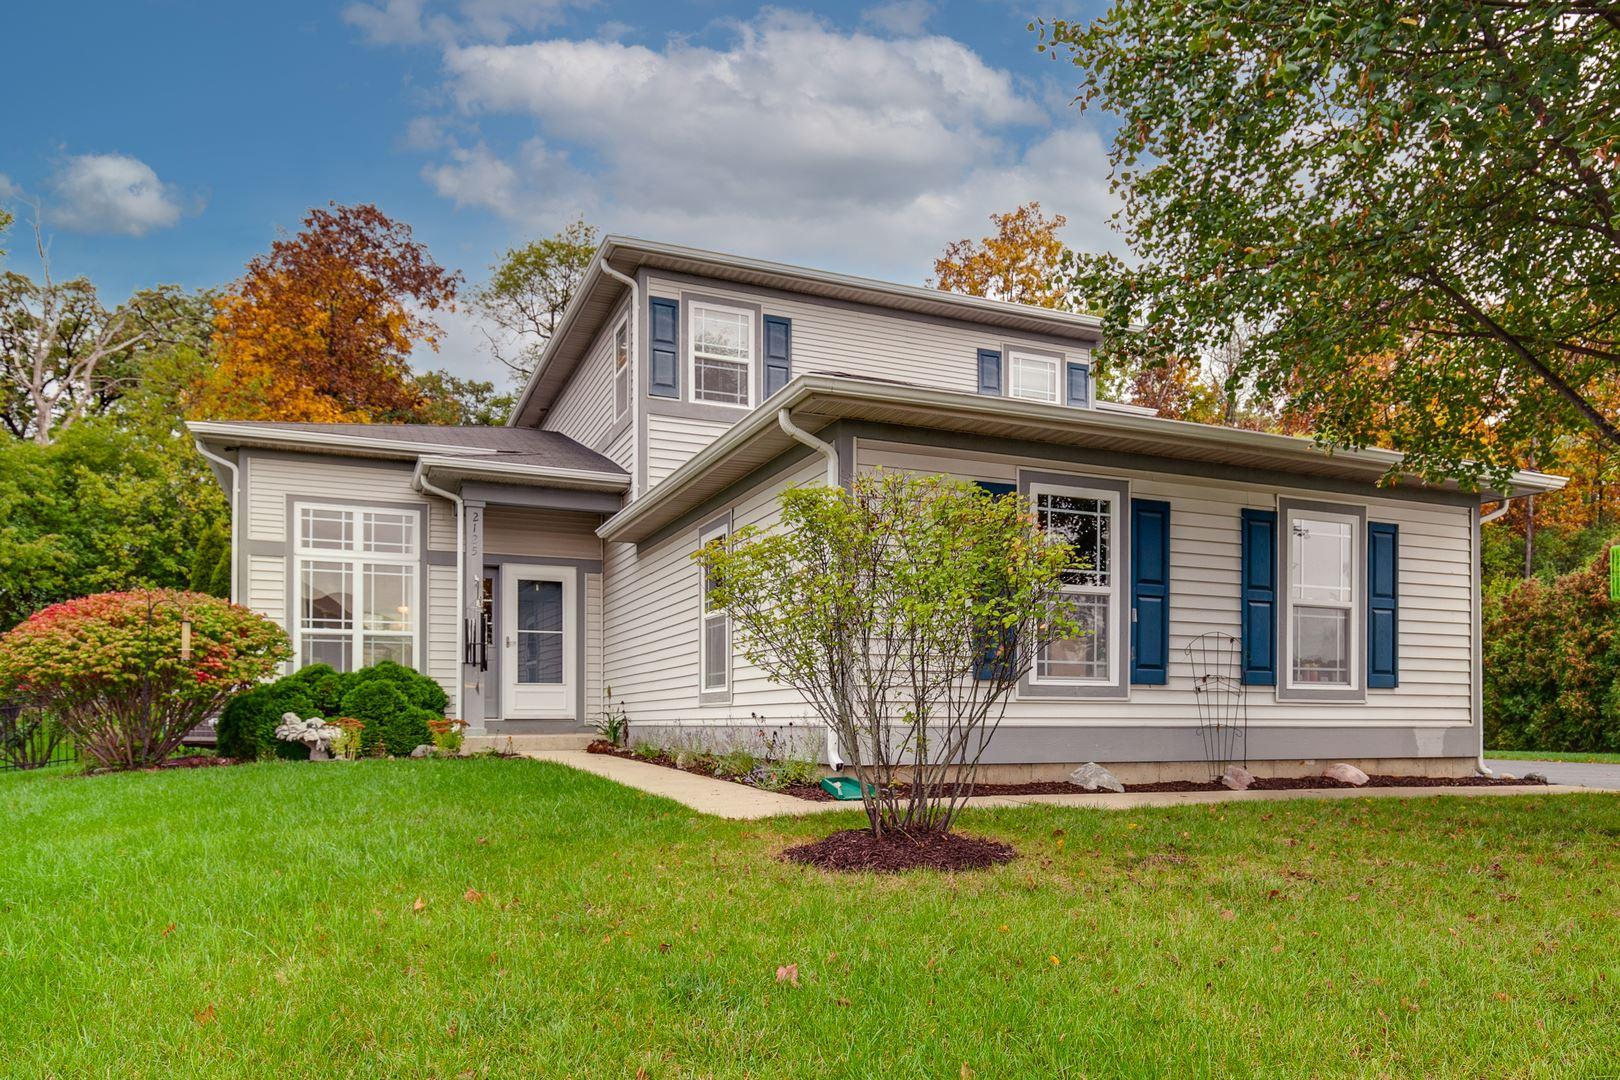 2125 Fairview Lane, Woodstock, IL 60098 - #: 11223825